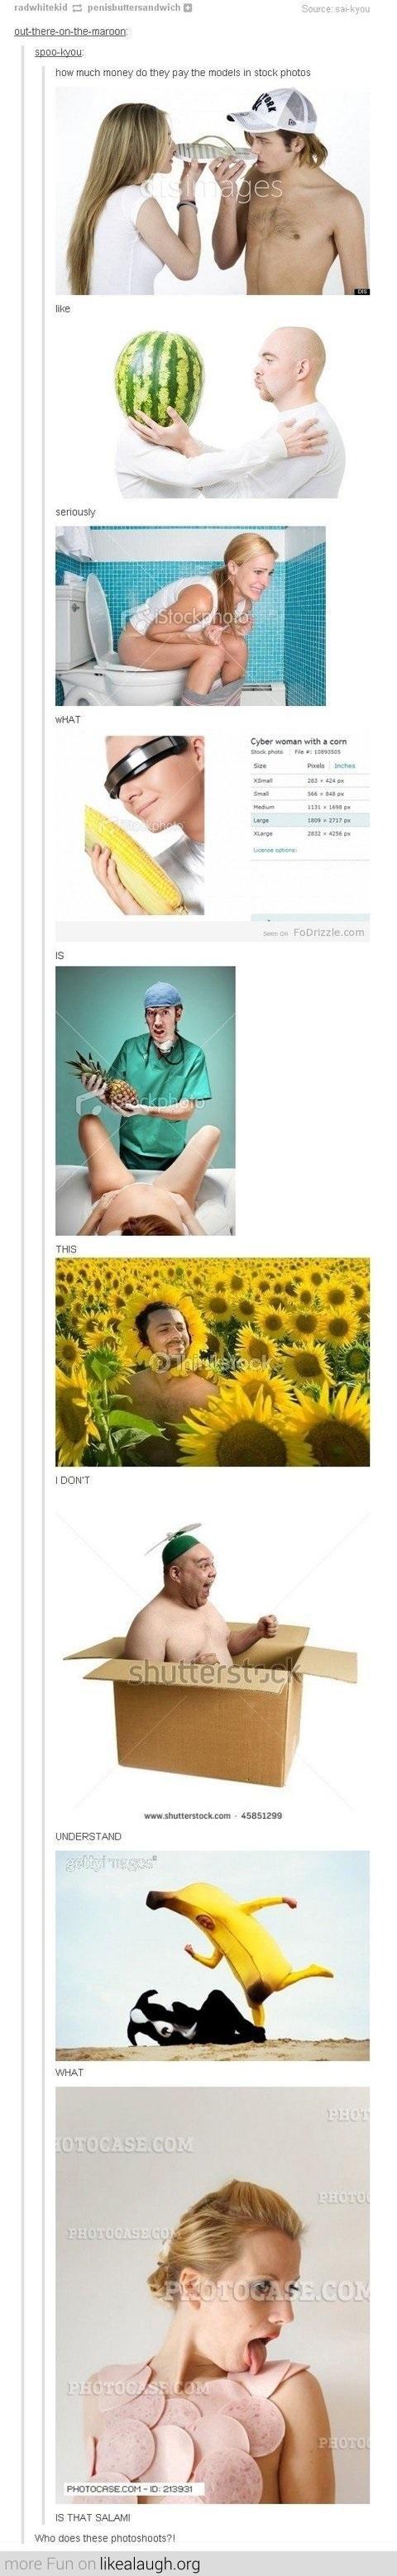 Stock photos can get  weird.